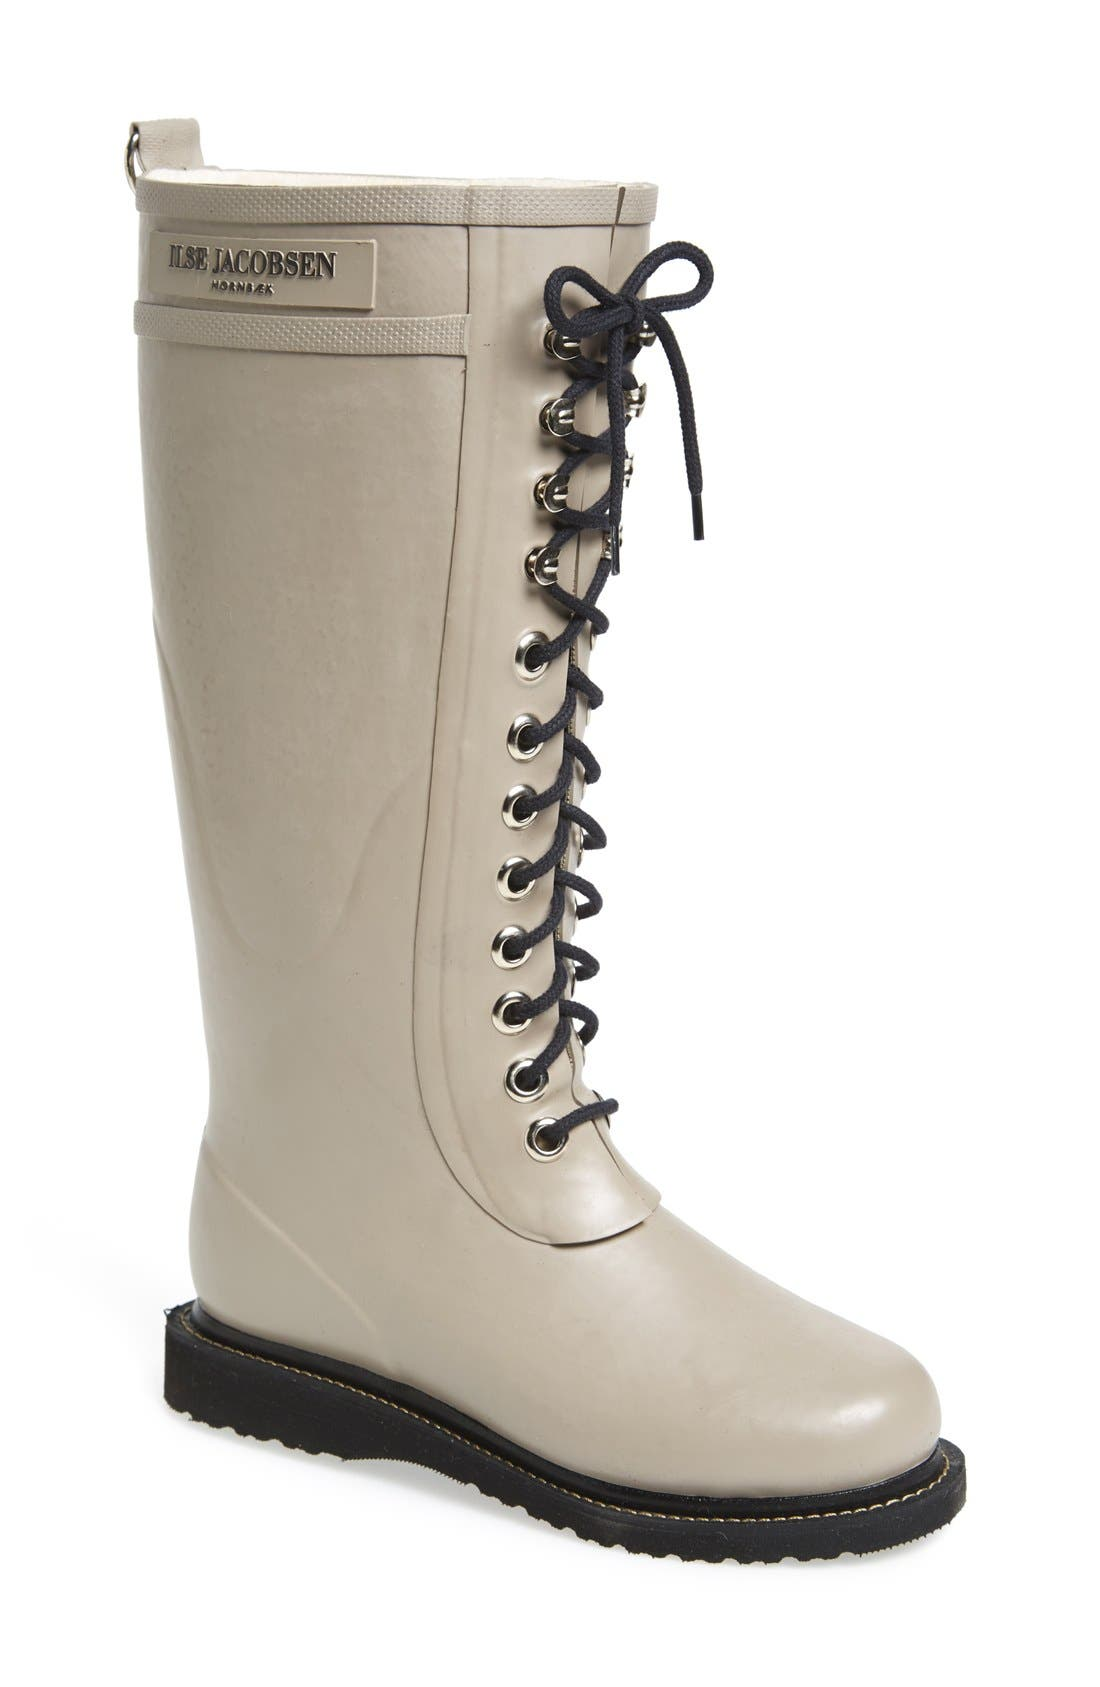 Alternate Image 1 Selected - Ilse Jacobsen Hornbæk Rubber Boot (Women) (Wide Calf)